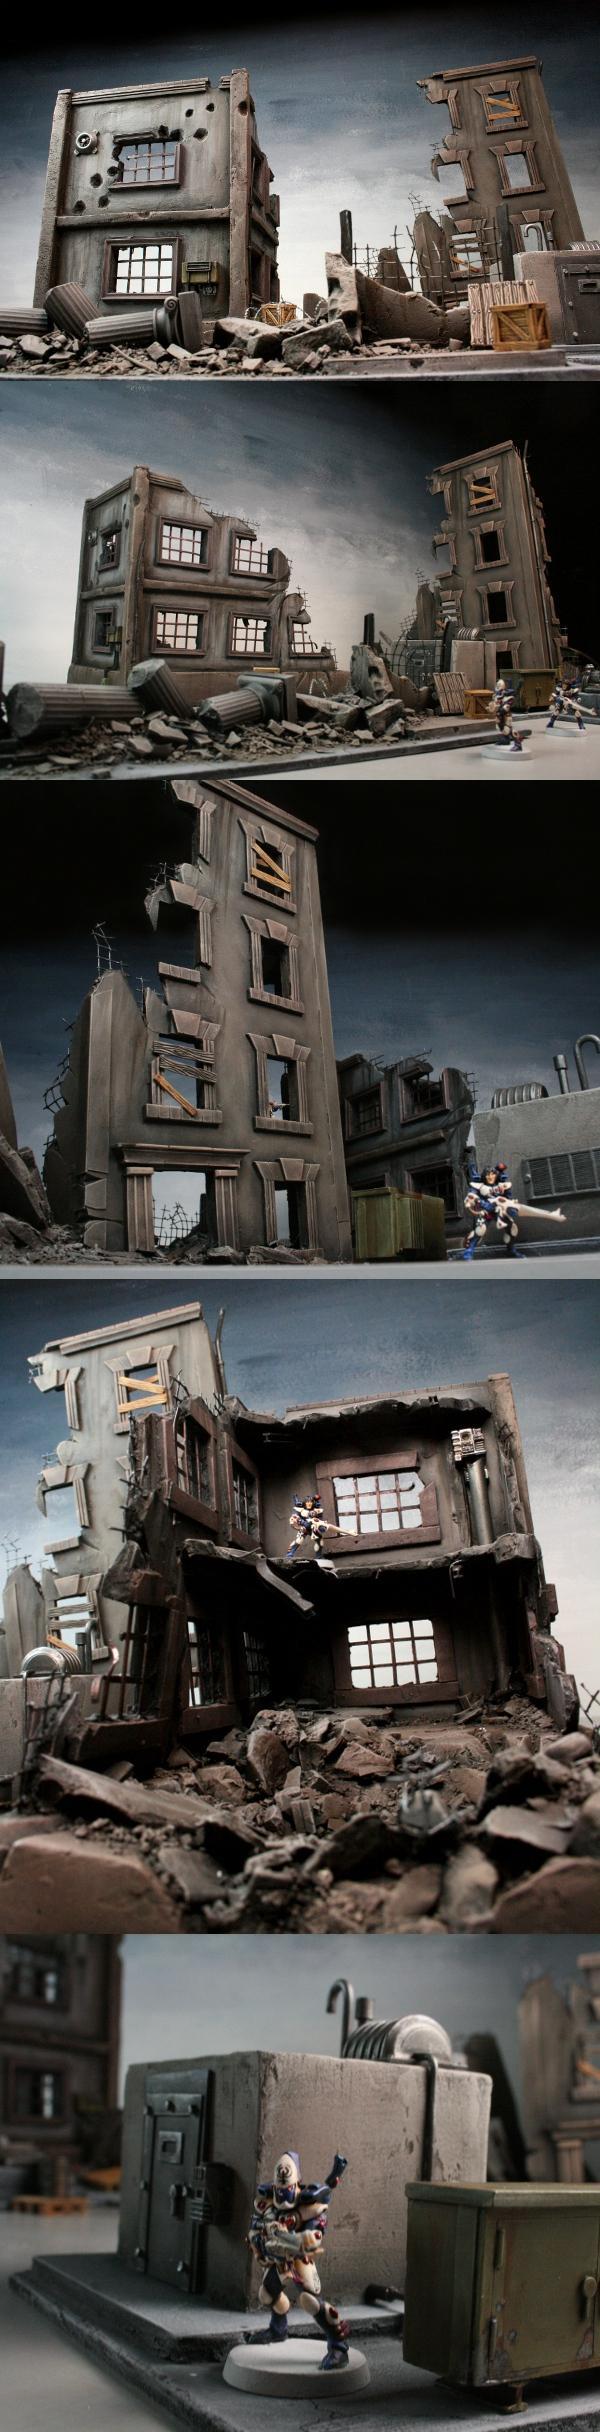 Cities Of Death, City, Infinity, Ruins, Set, Terraformer, Urban, Wargames, Warhammer 40,000